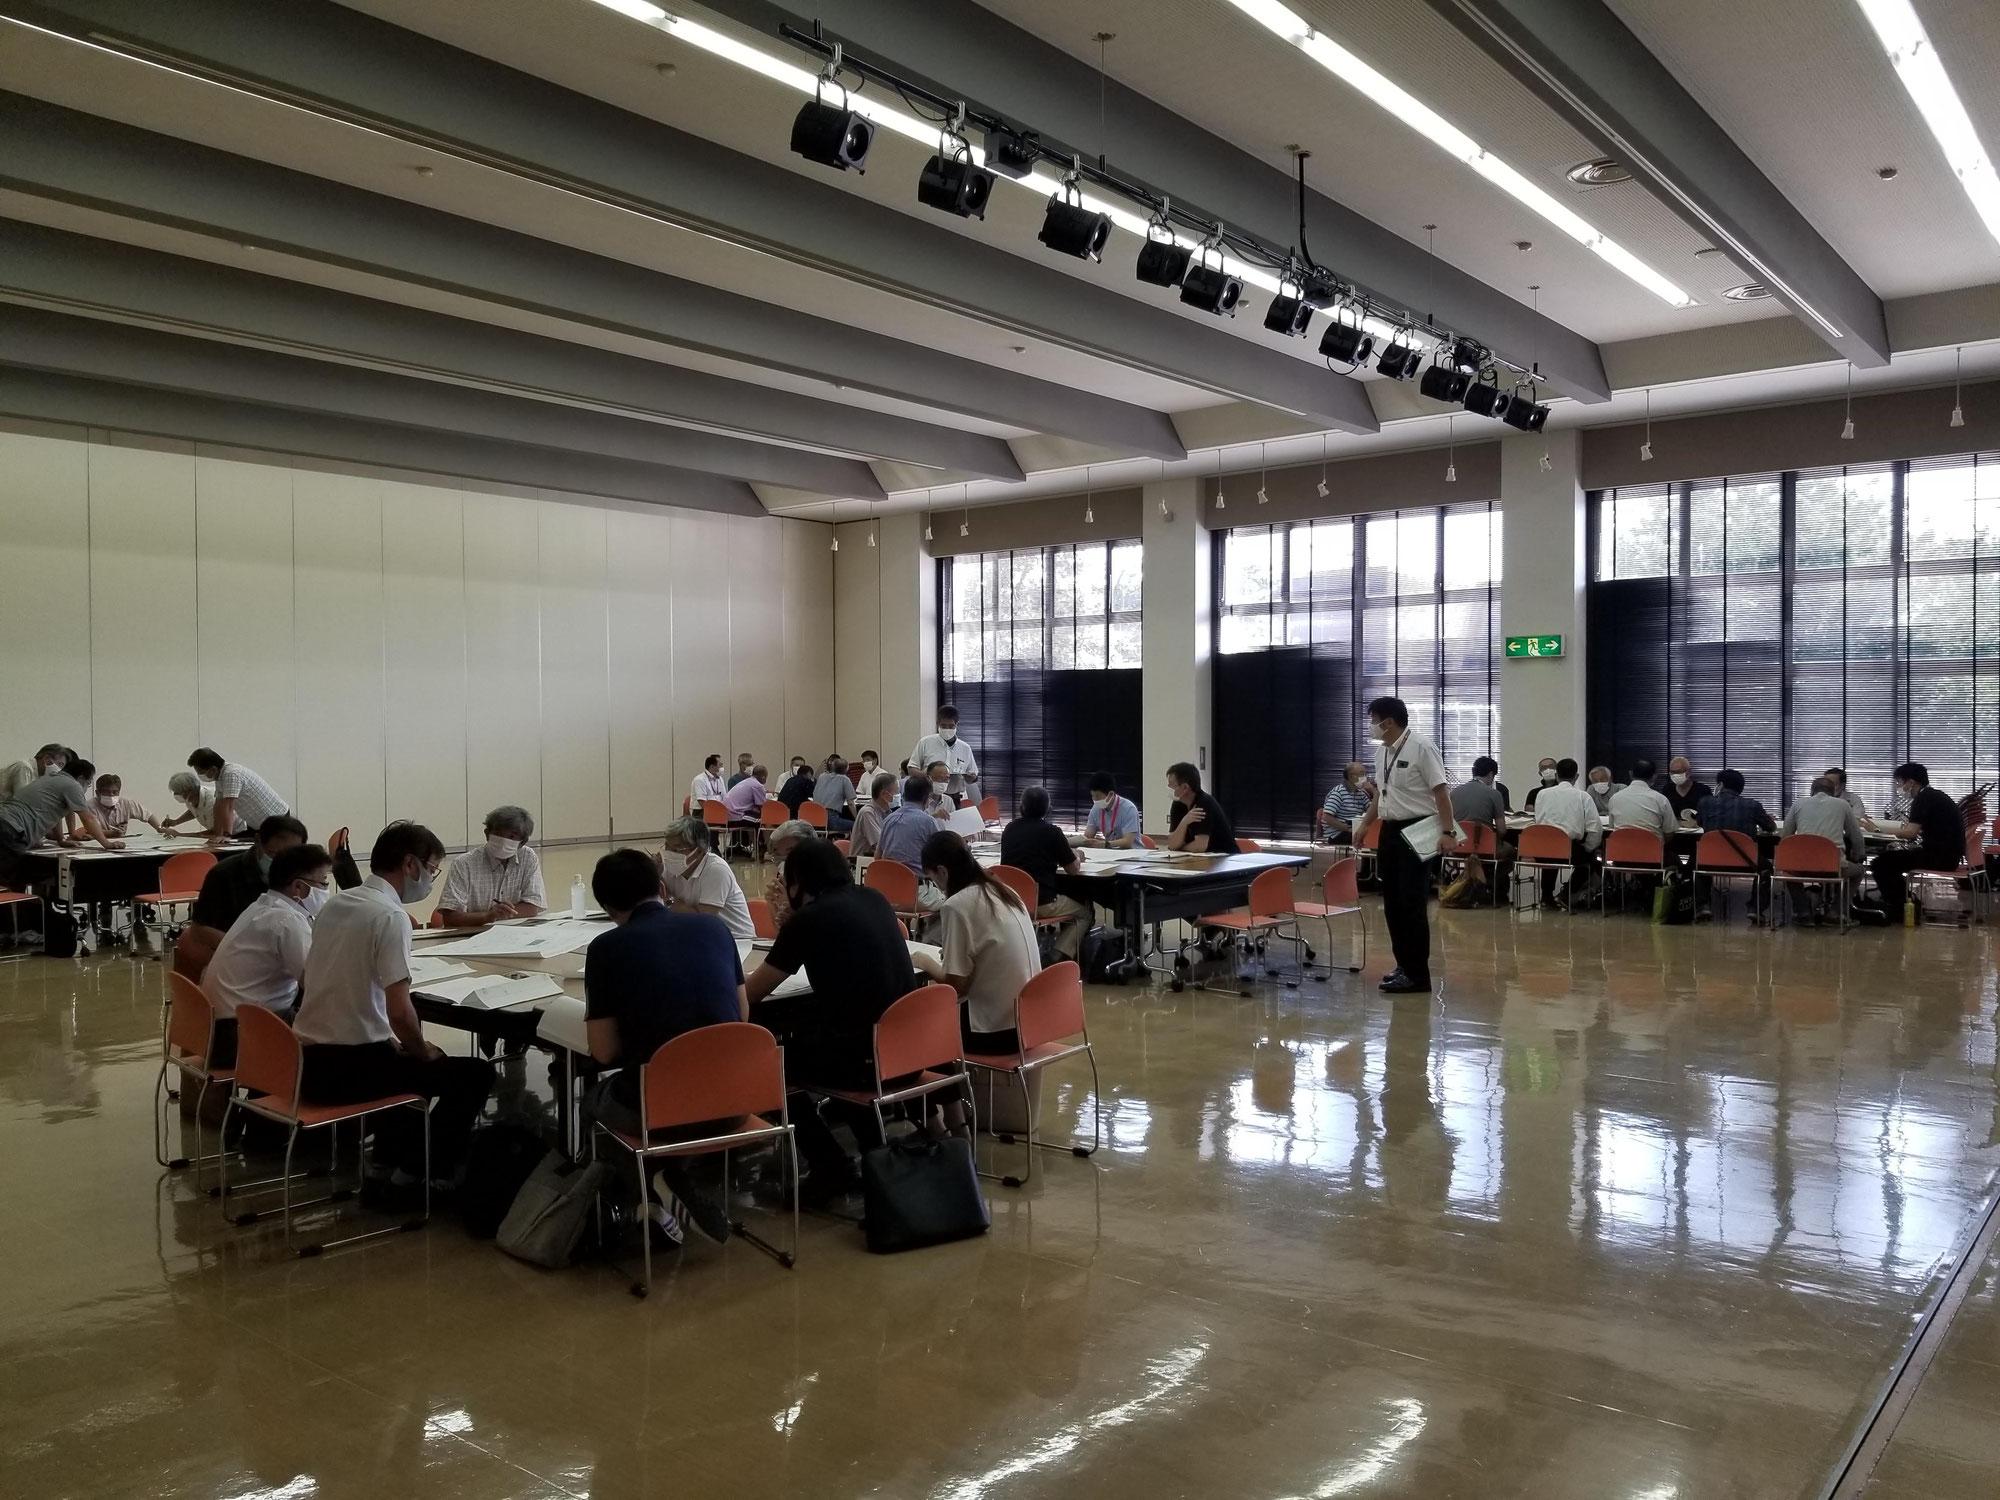 妙高市避難所運営研修会(HUG研修)を開催